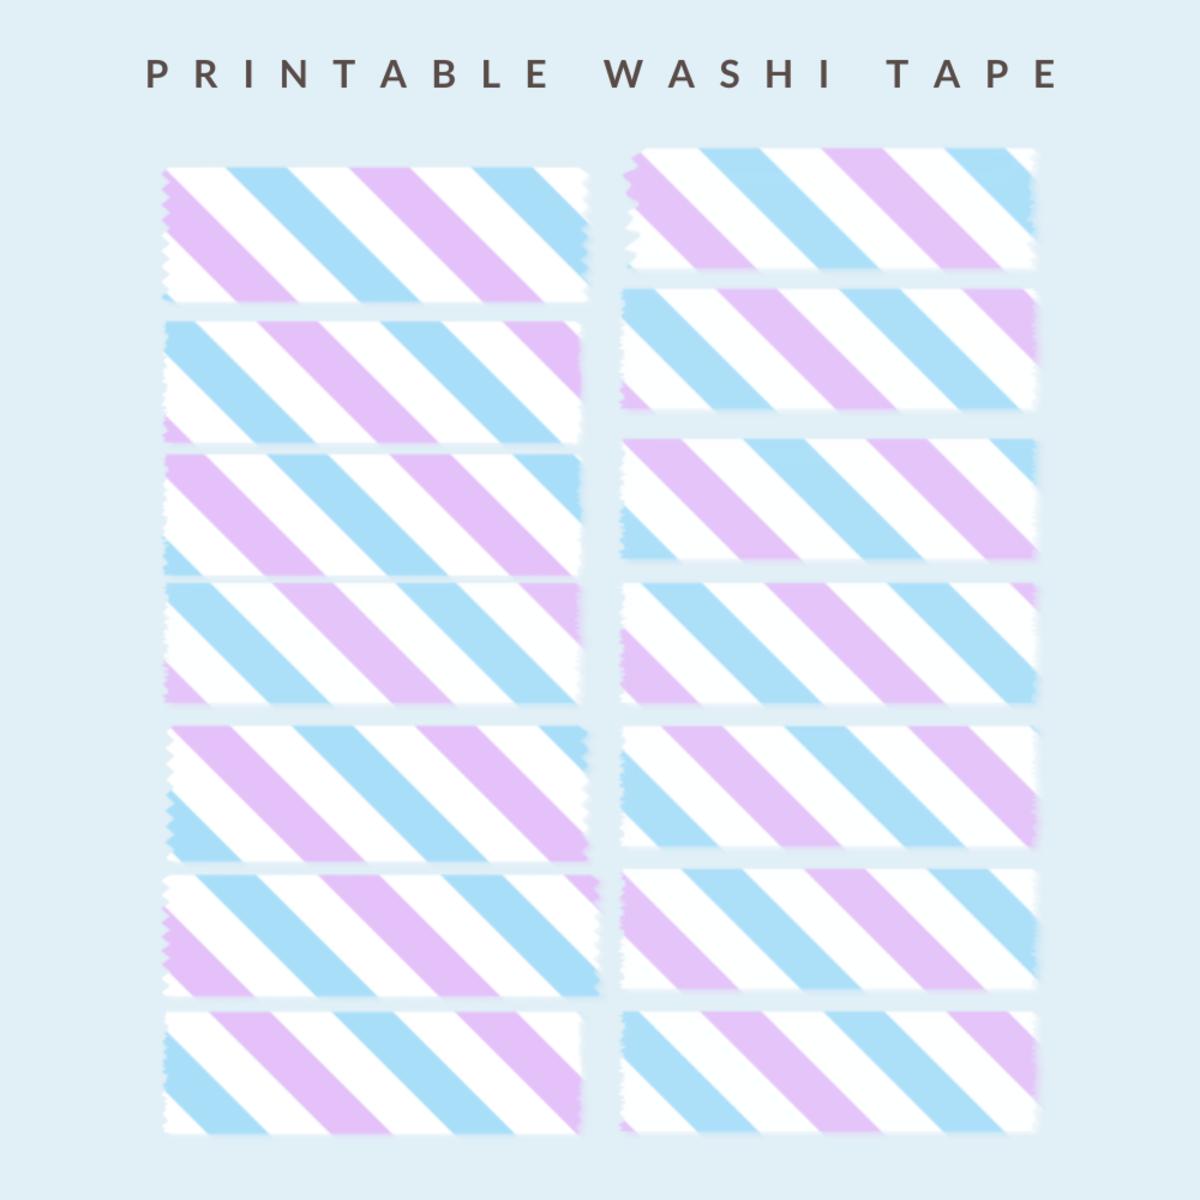 printable-washi-tape-designs